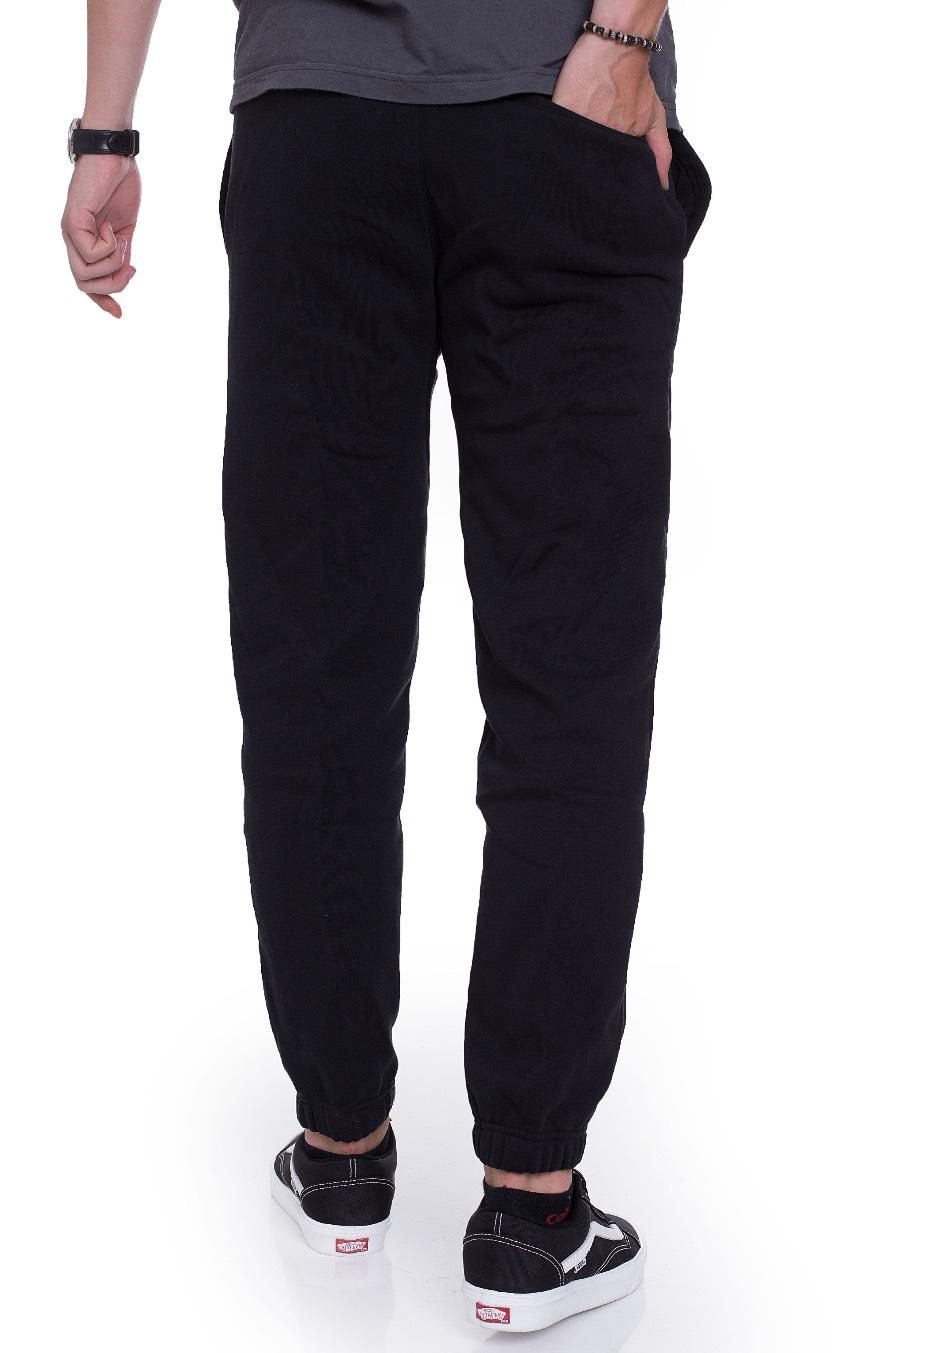 official photos 6eb24 09bc7 nike sb icon fleece black black sweat pants back lg.jpg